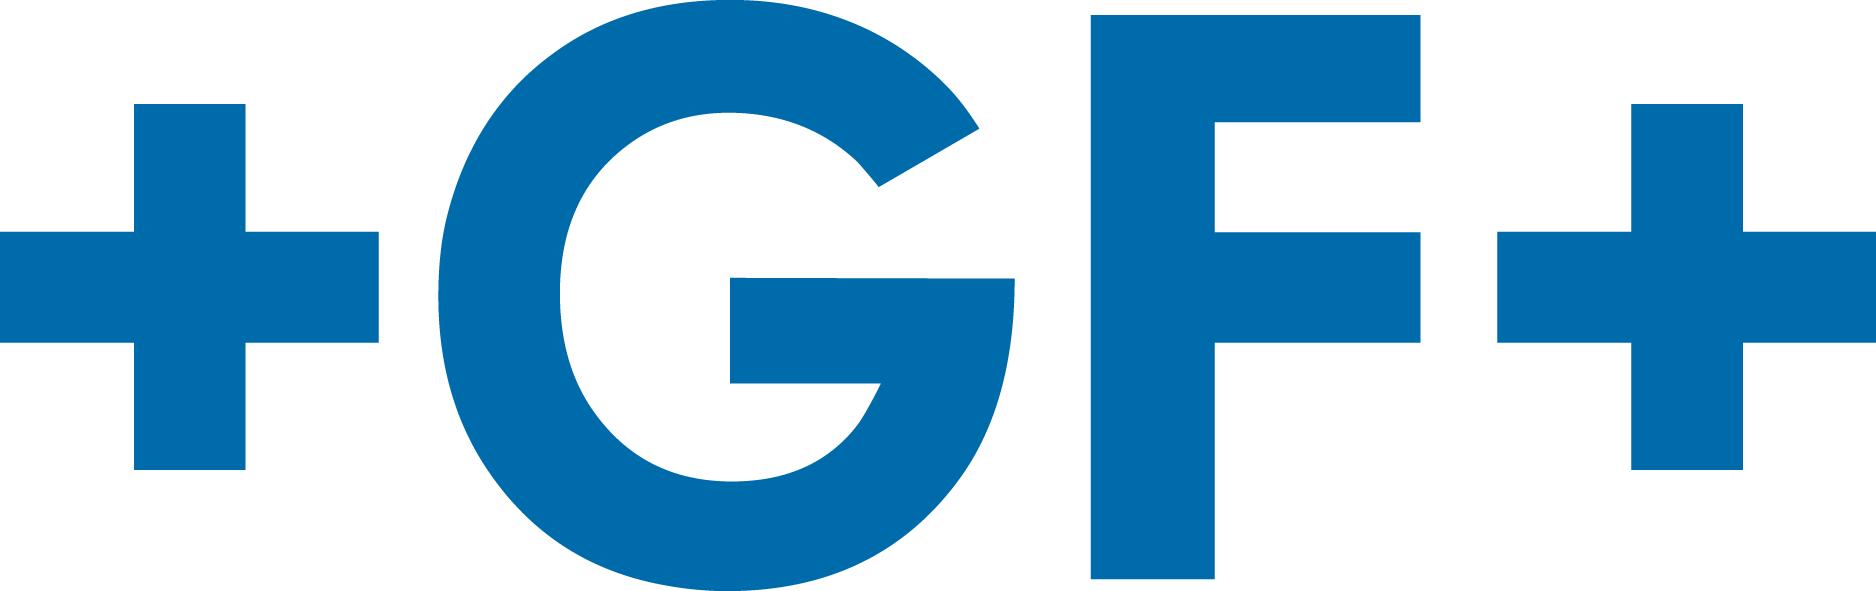 GF meco eckel GmbH & Co. KG Biedenkopf